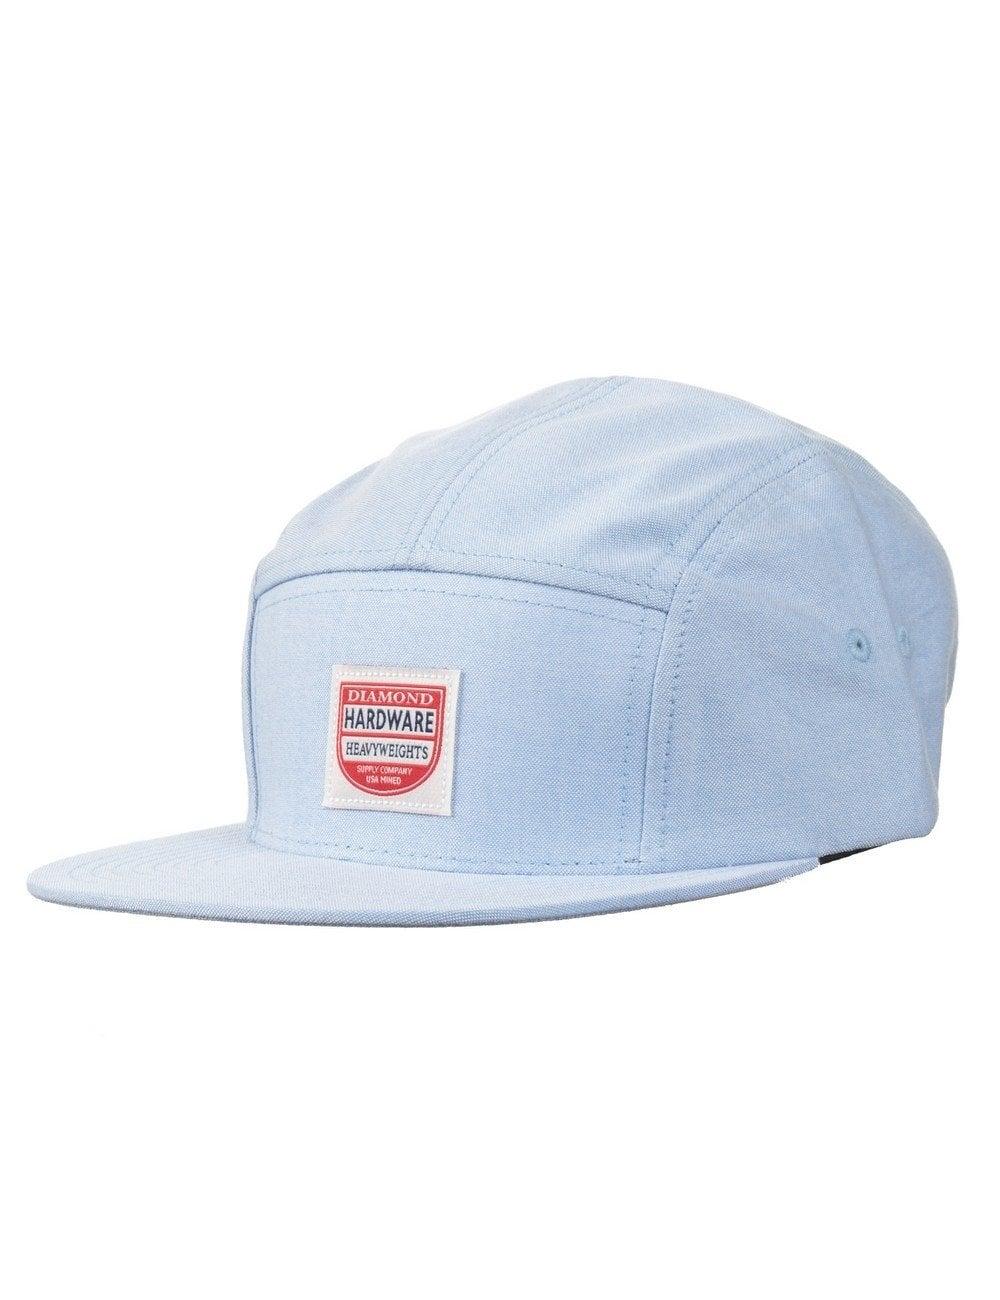 330f2b8e33ab0 ... usa the port 5 panel hat light blue d039e 70095